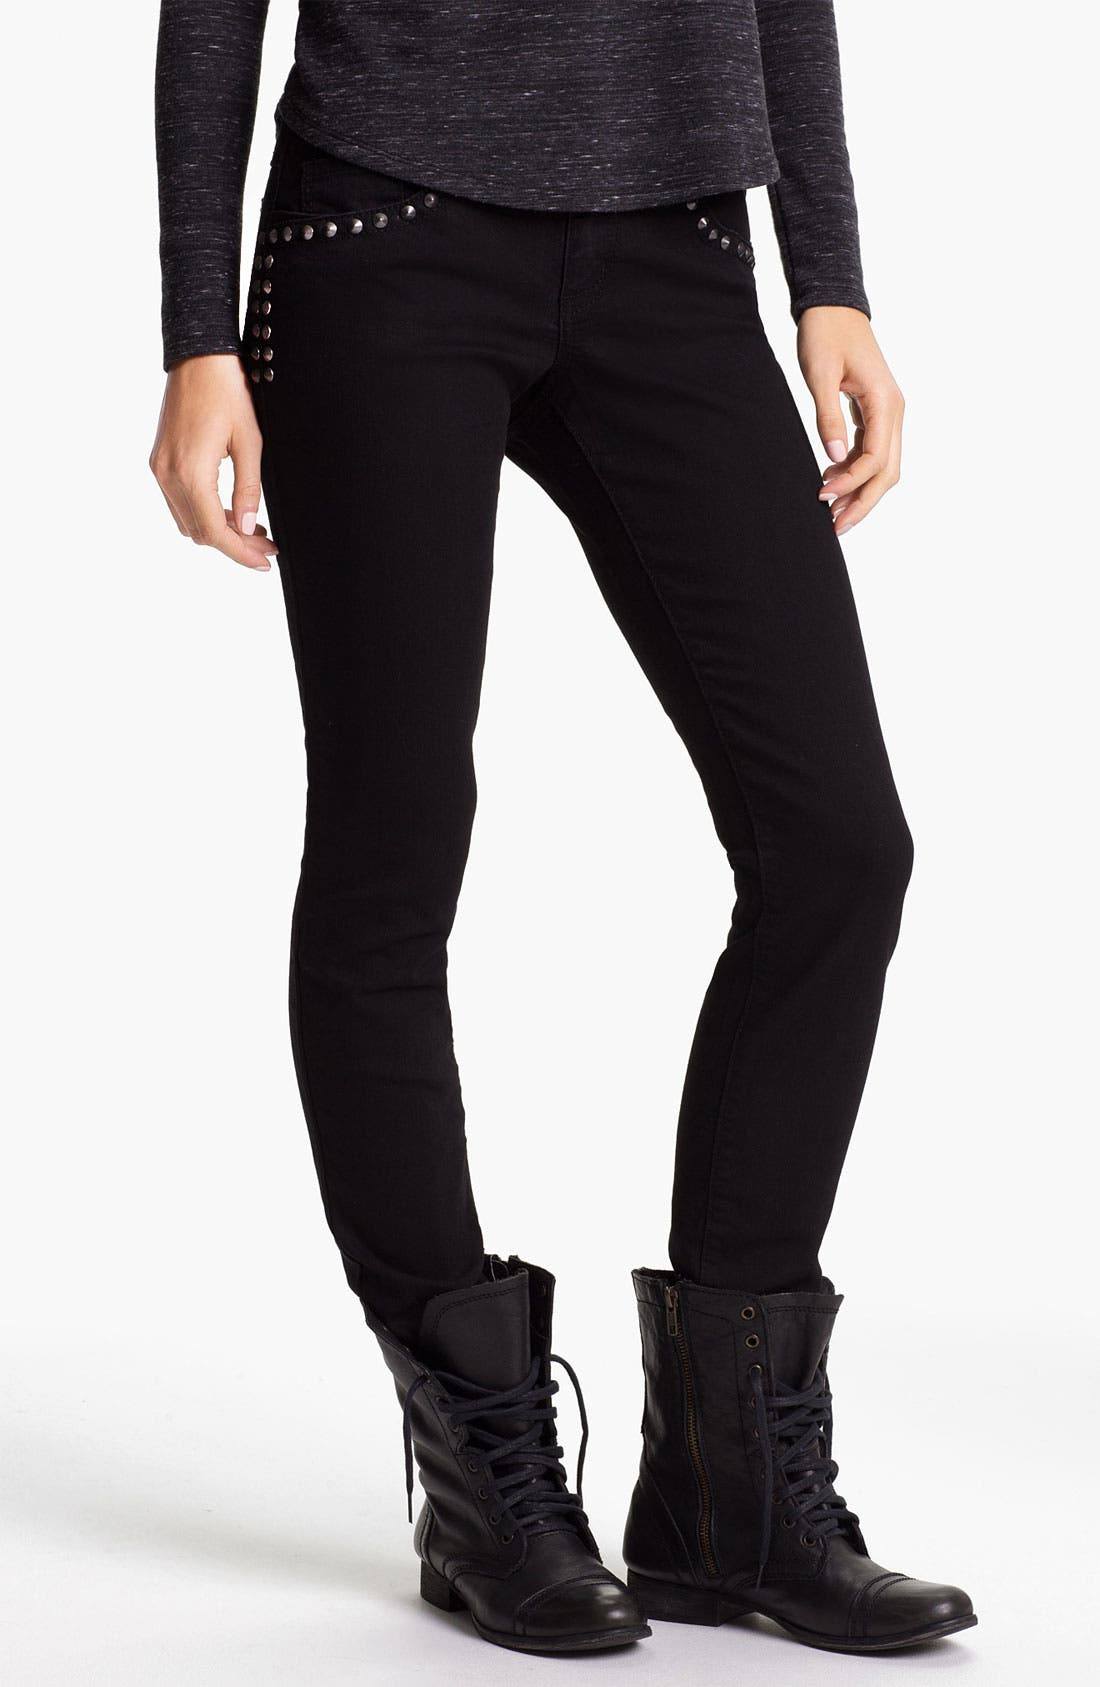 Alternate Image 1 Selected - Jolt Studded Skinny Jeans (Juniors)